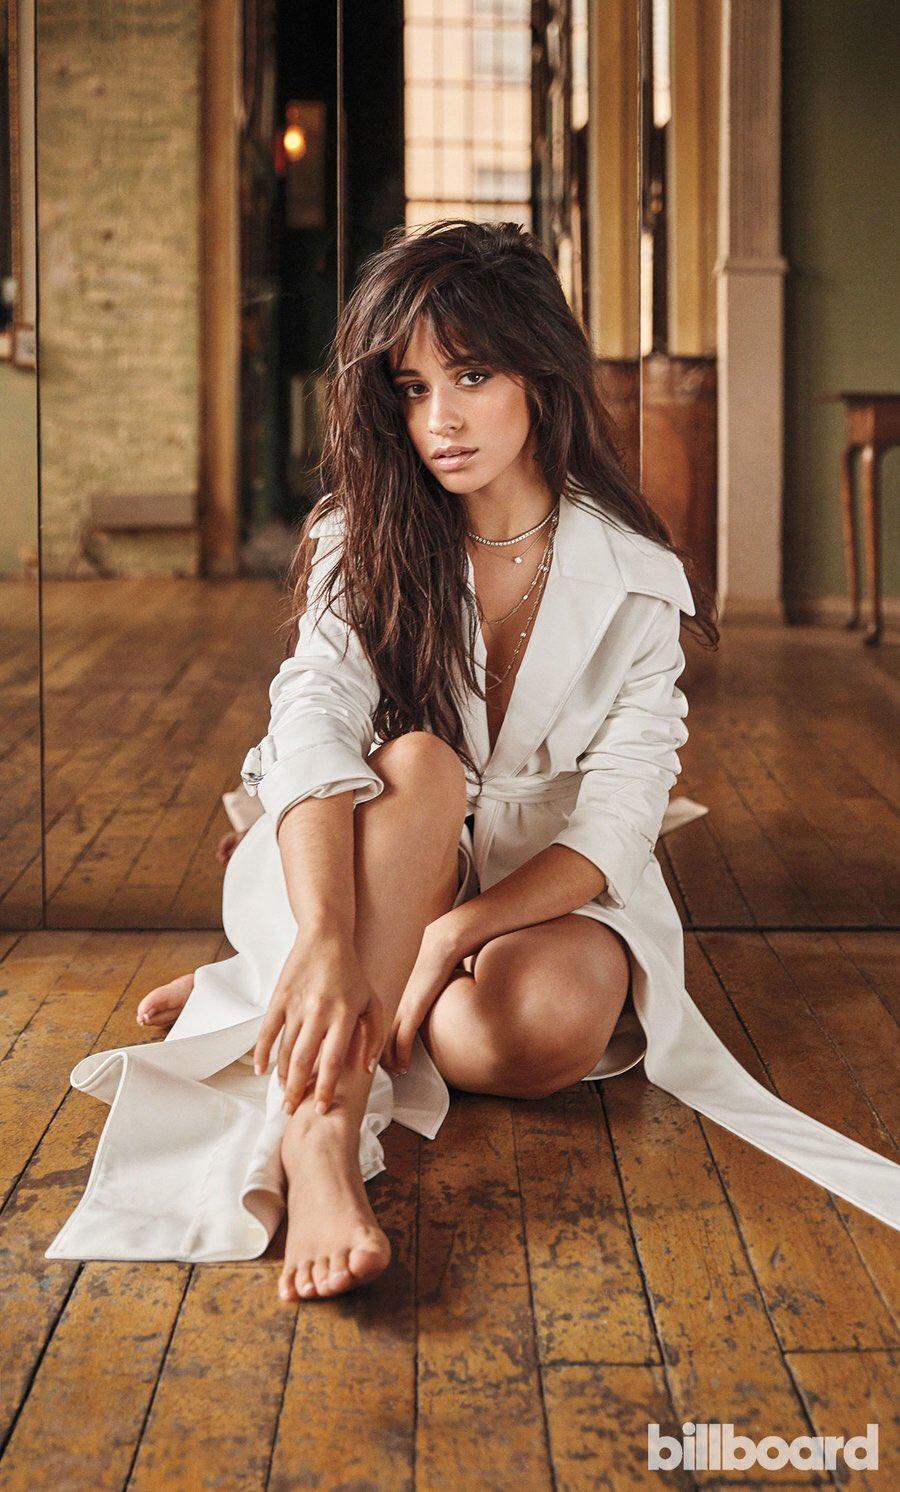 Billboard: Happy birthday, Camila_Cabello!